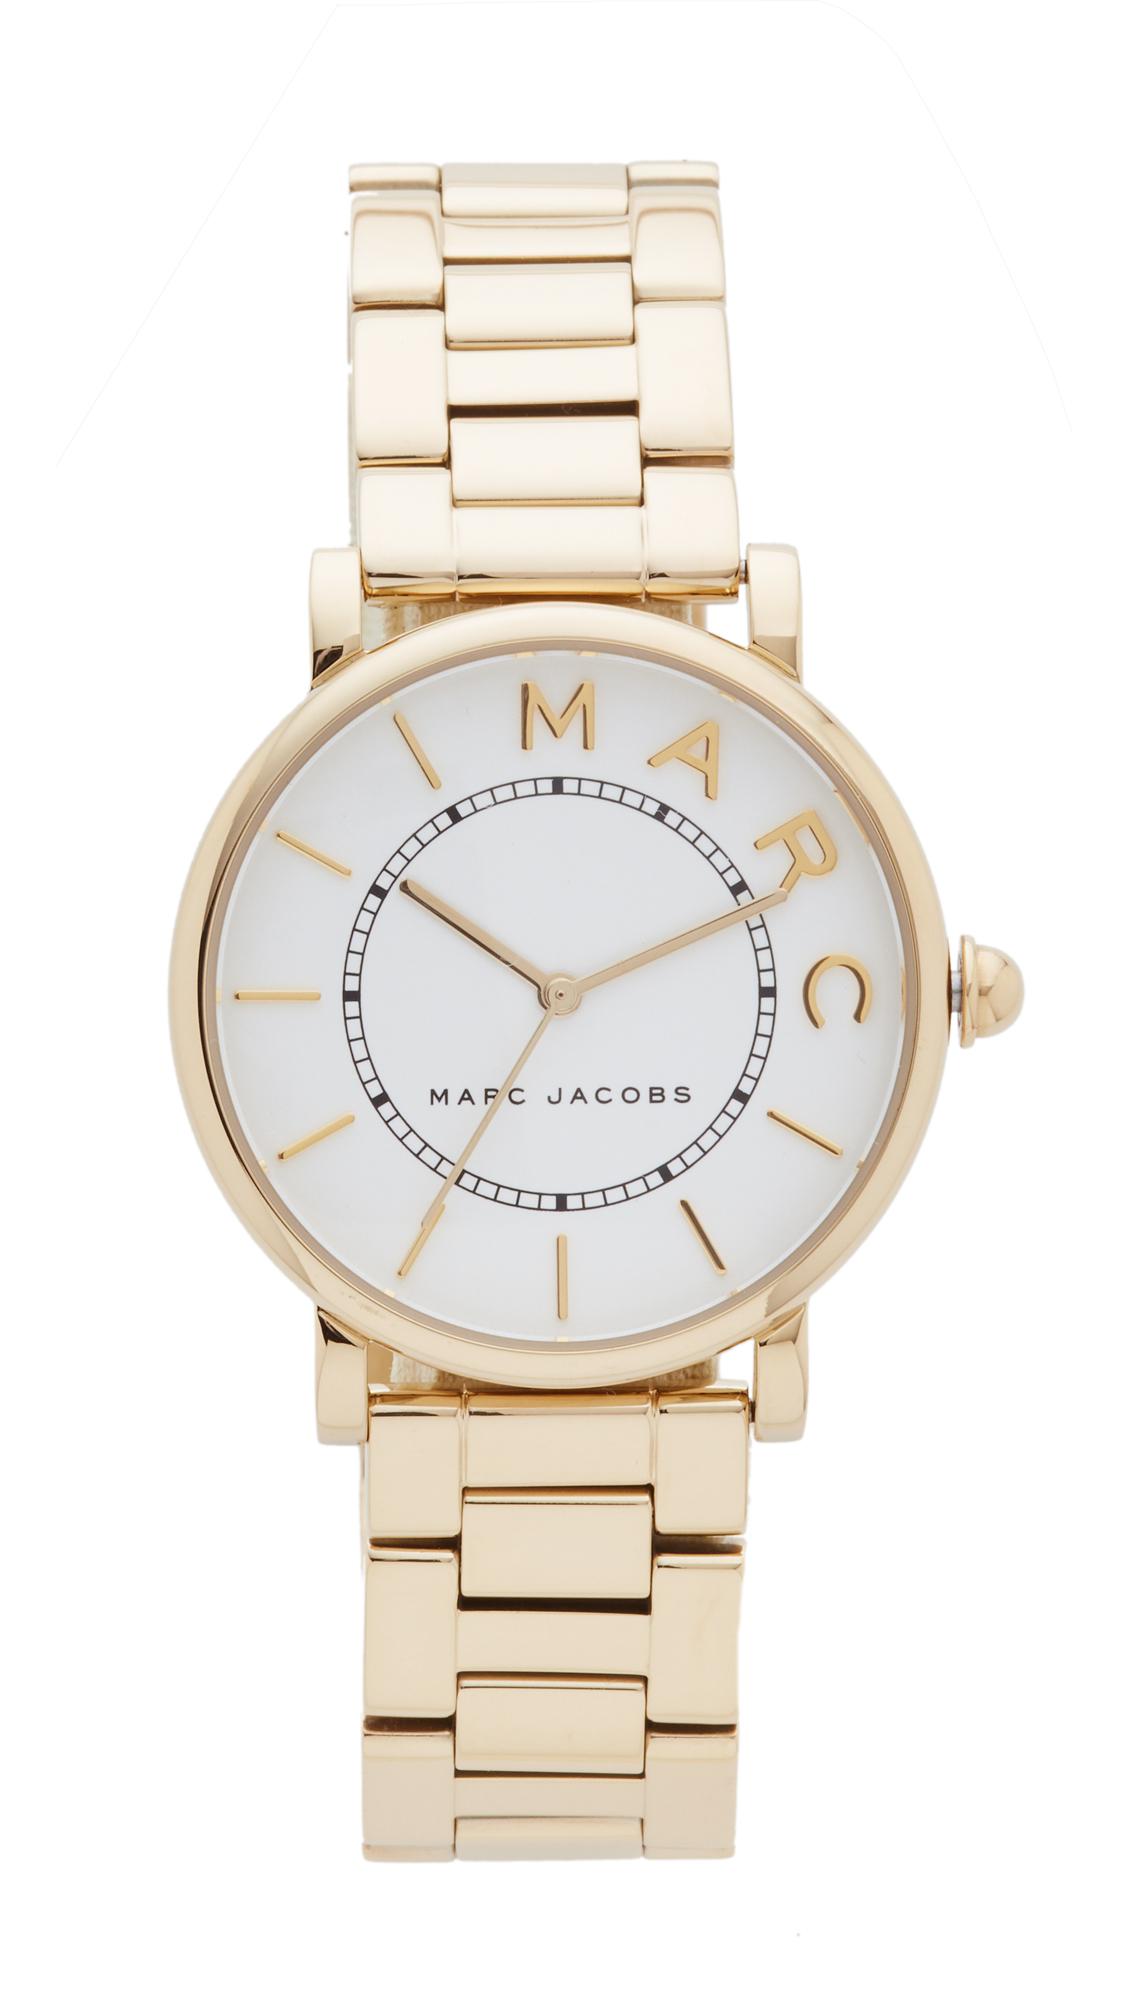 Marc Jacobs Roxy Watch - Gold/White Satin